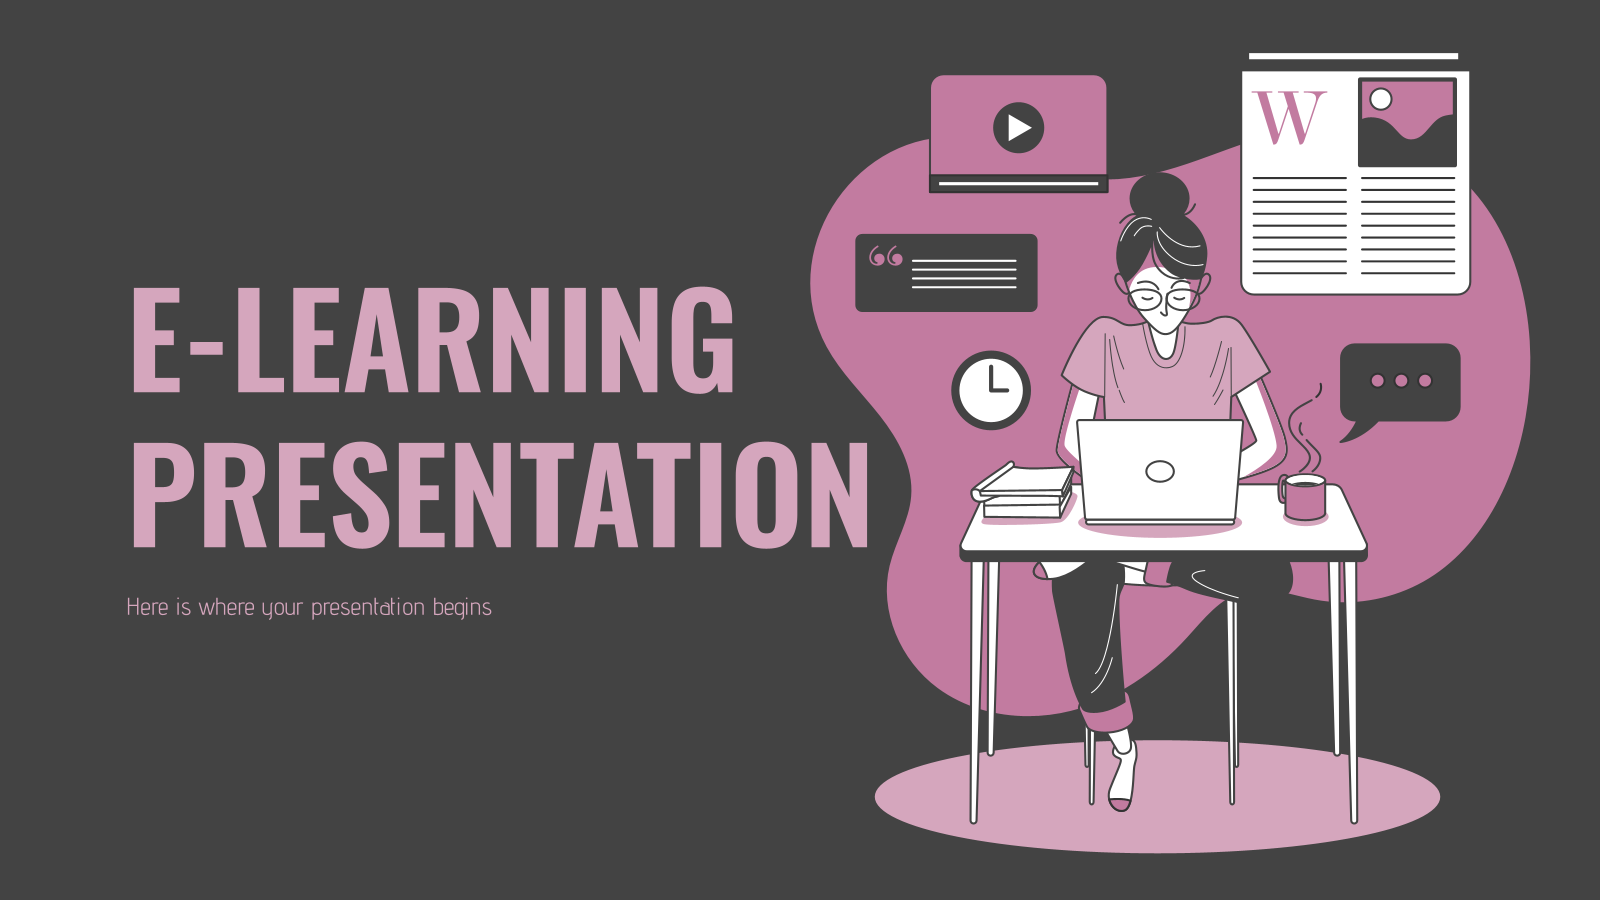 E-Learning presentation template